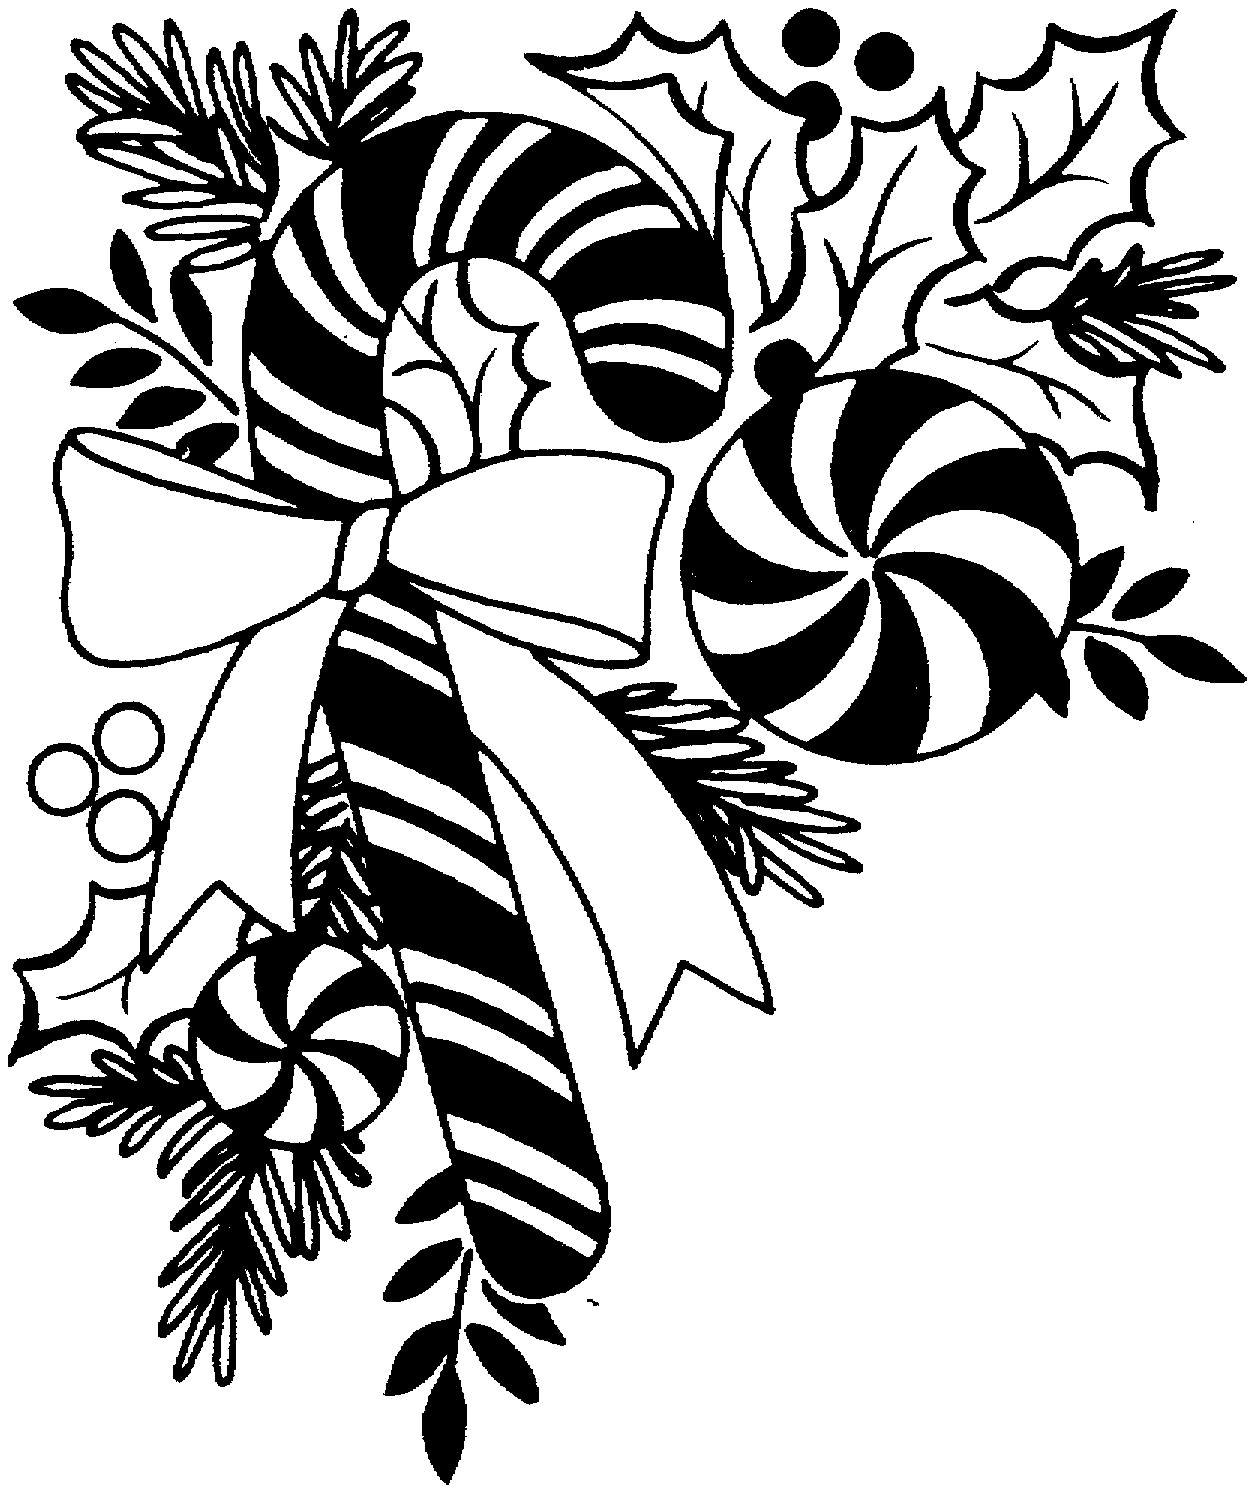 Christmas Clip Art Black And White Free Trick In 2020 Christmas Wallpaper Free Christmas Images Free Christmas Border